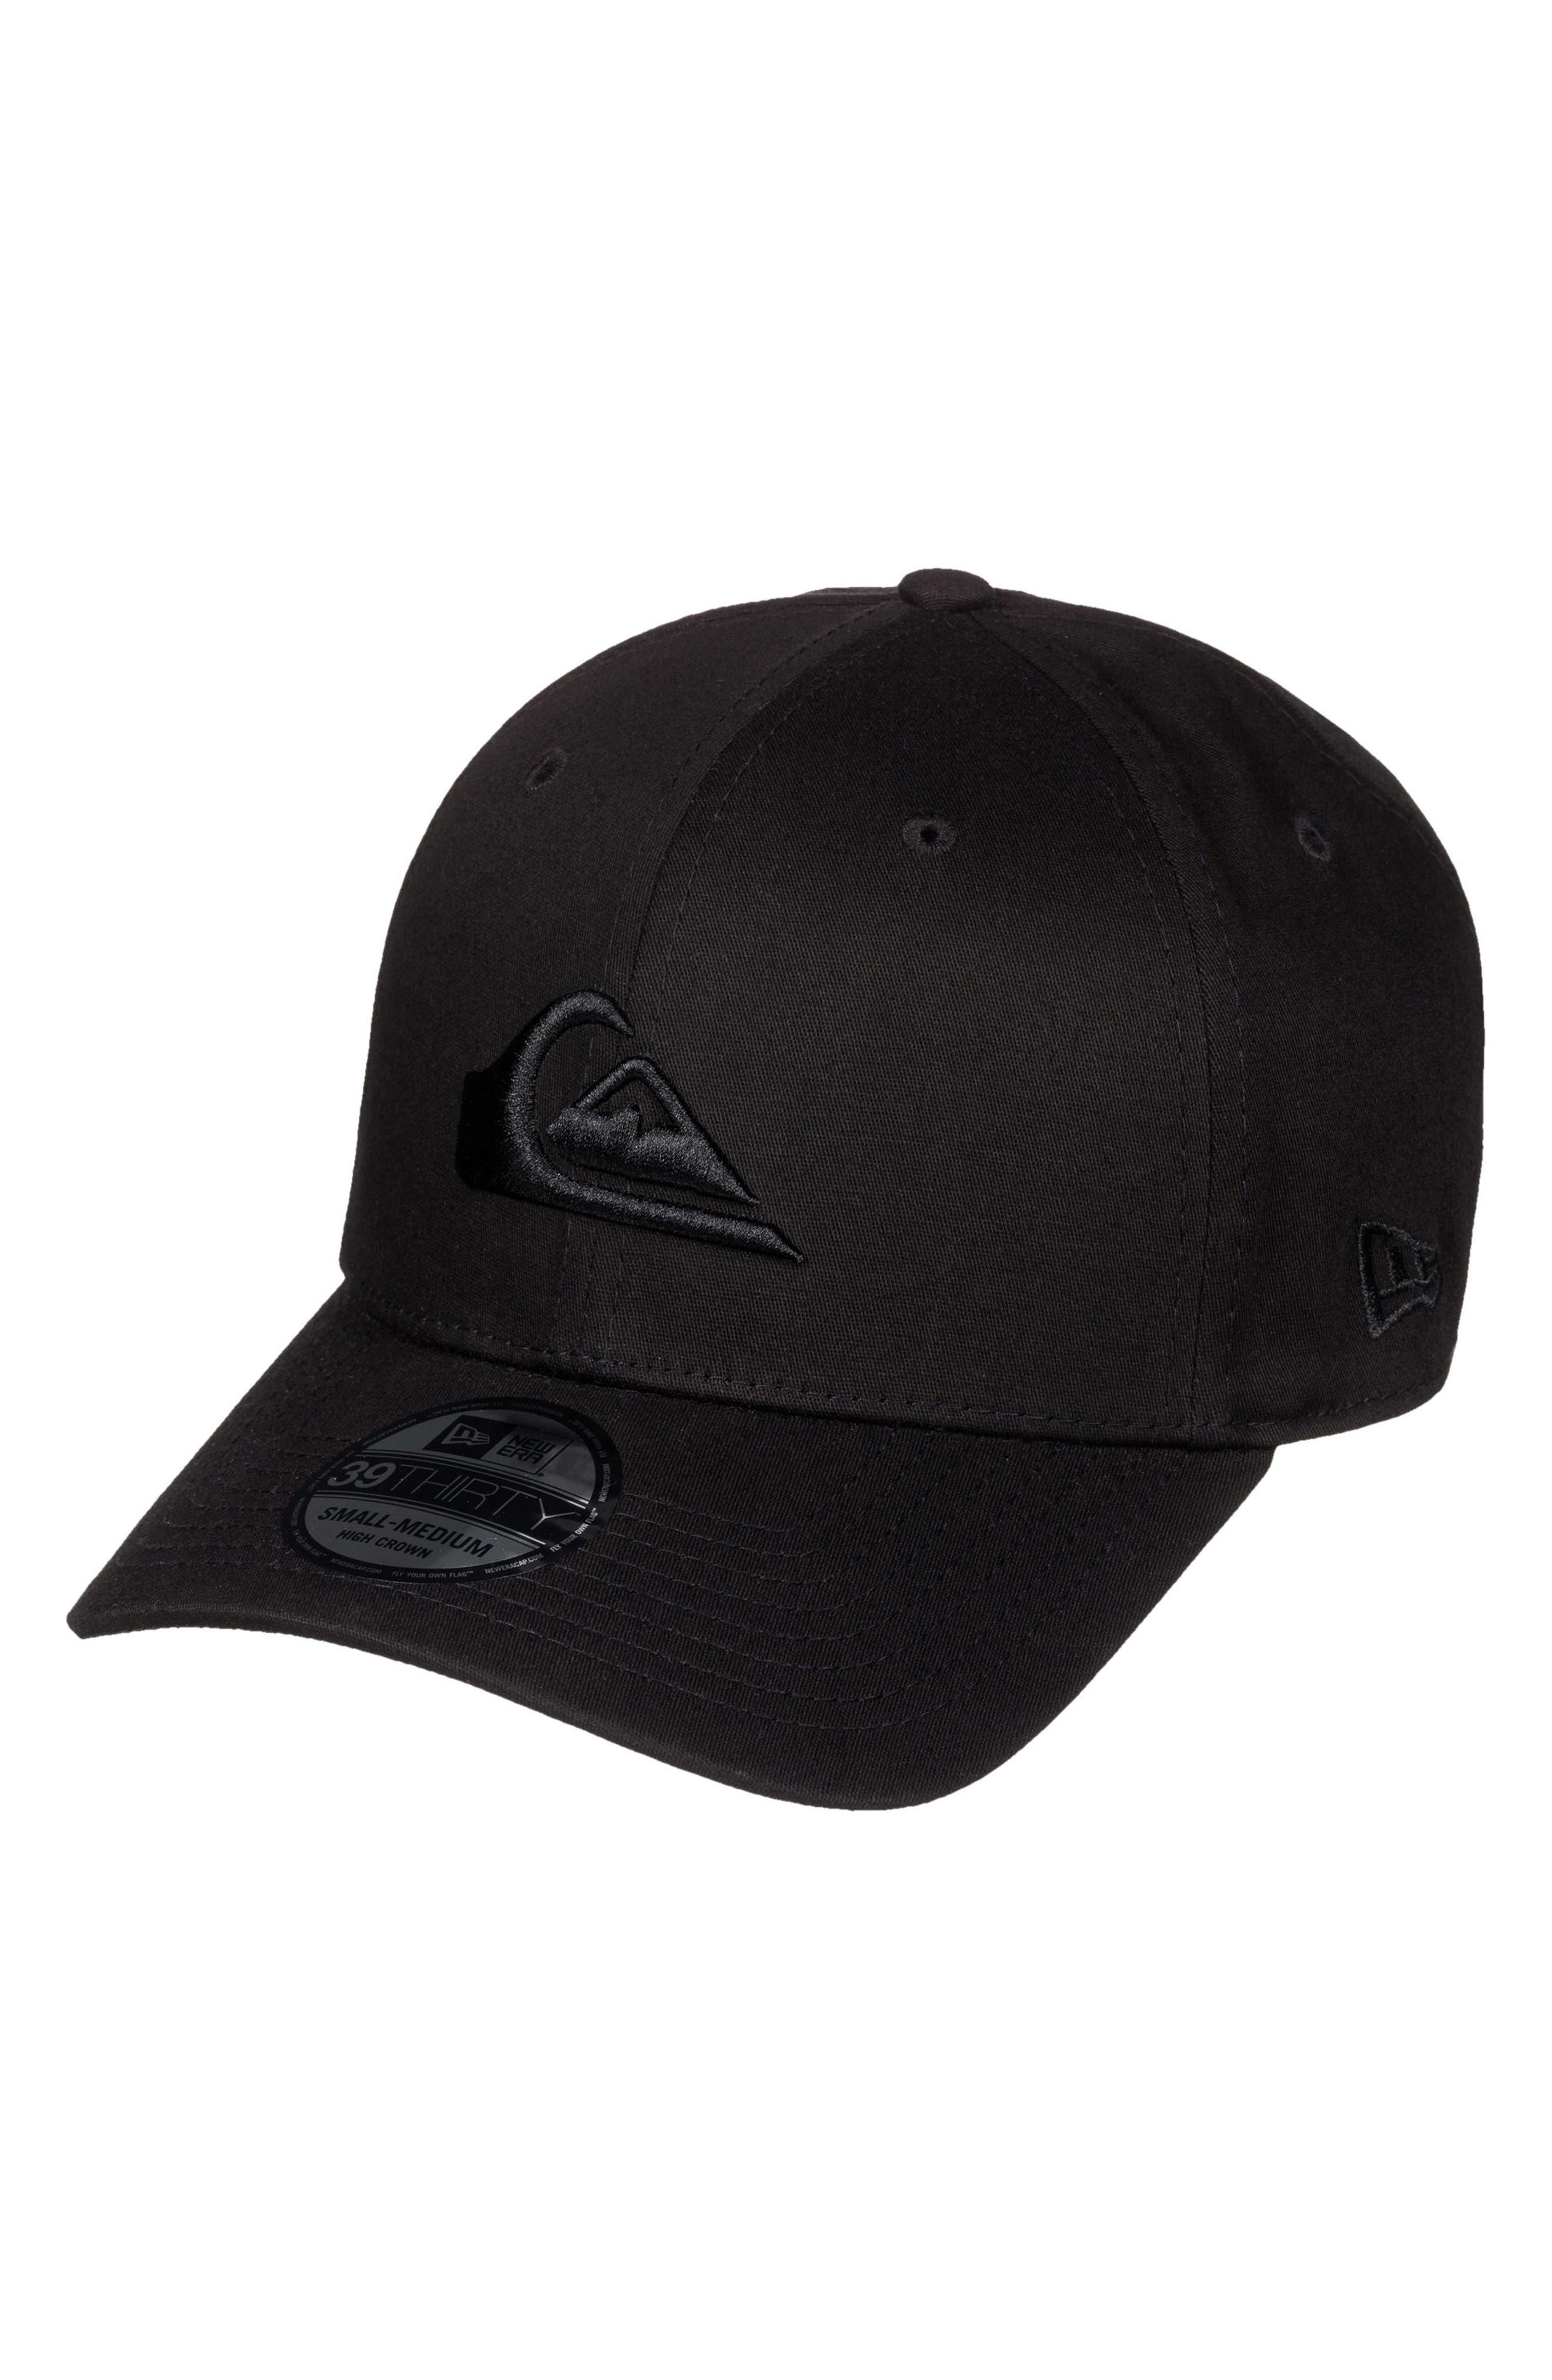 Mountain & Wave Baseball Cap,                             Main thumbnail 1, color,                             BLACK